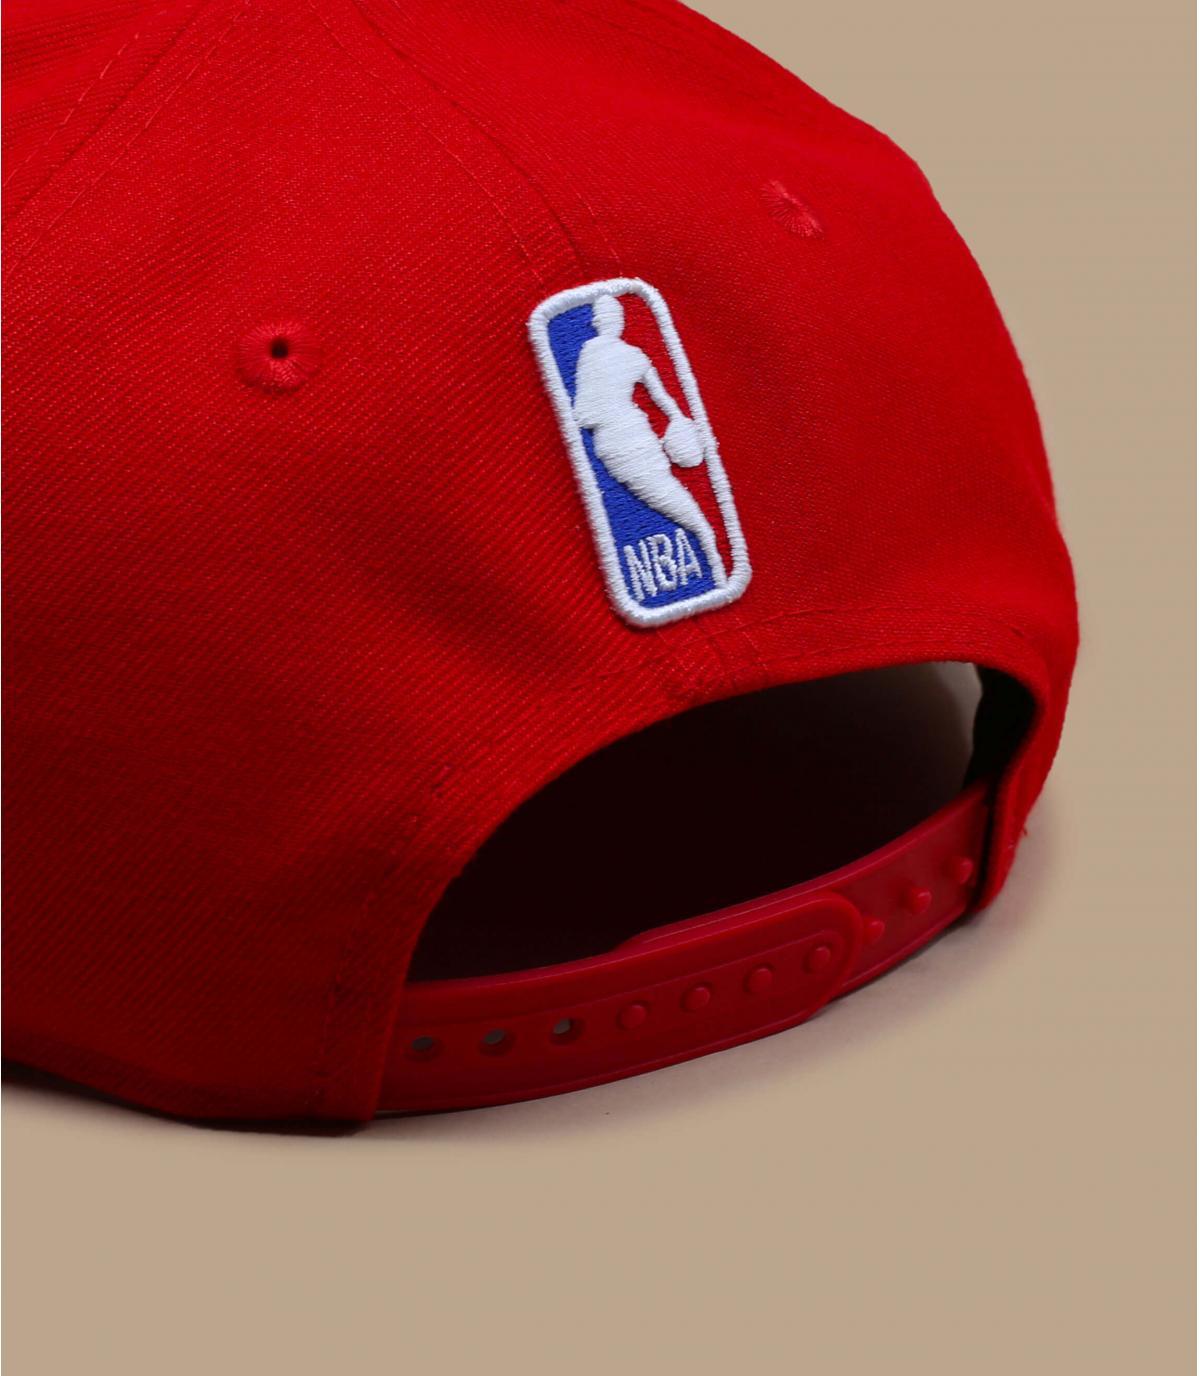 Détails Snapback NBA Draft Bulls 950 - image 4